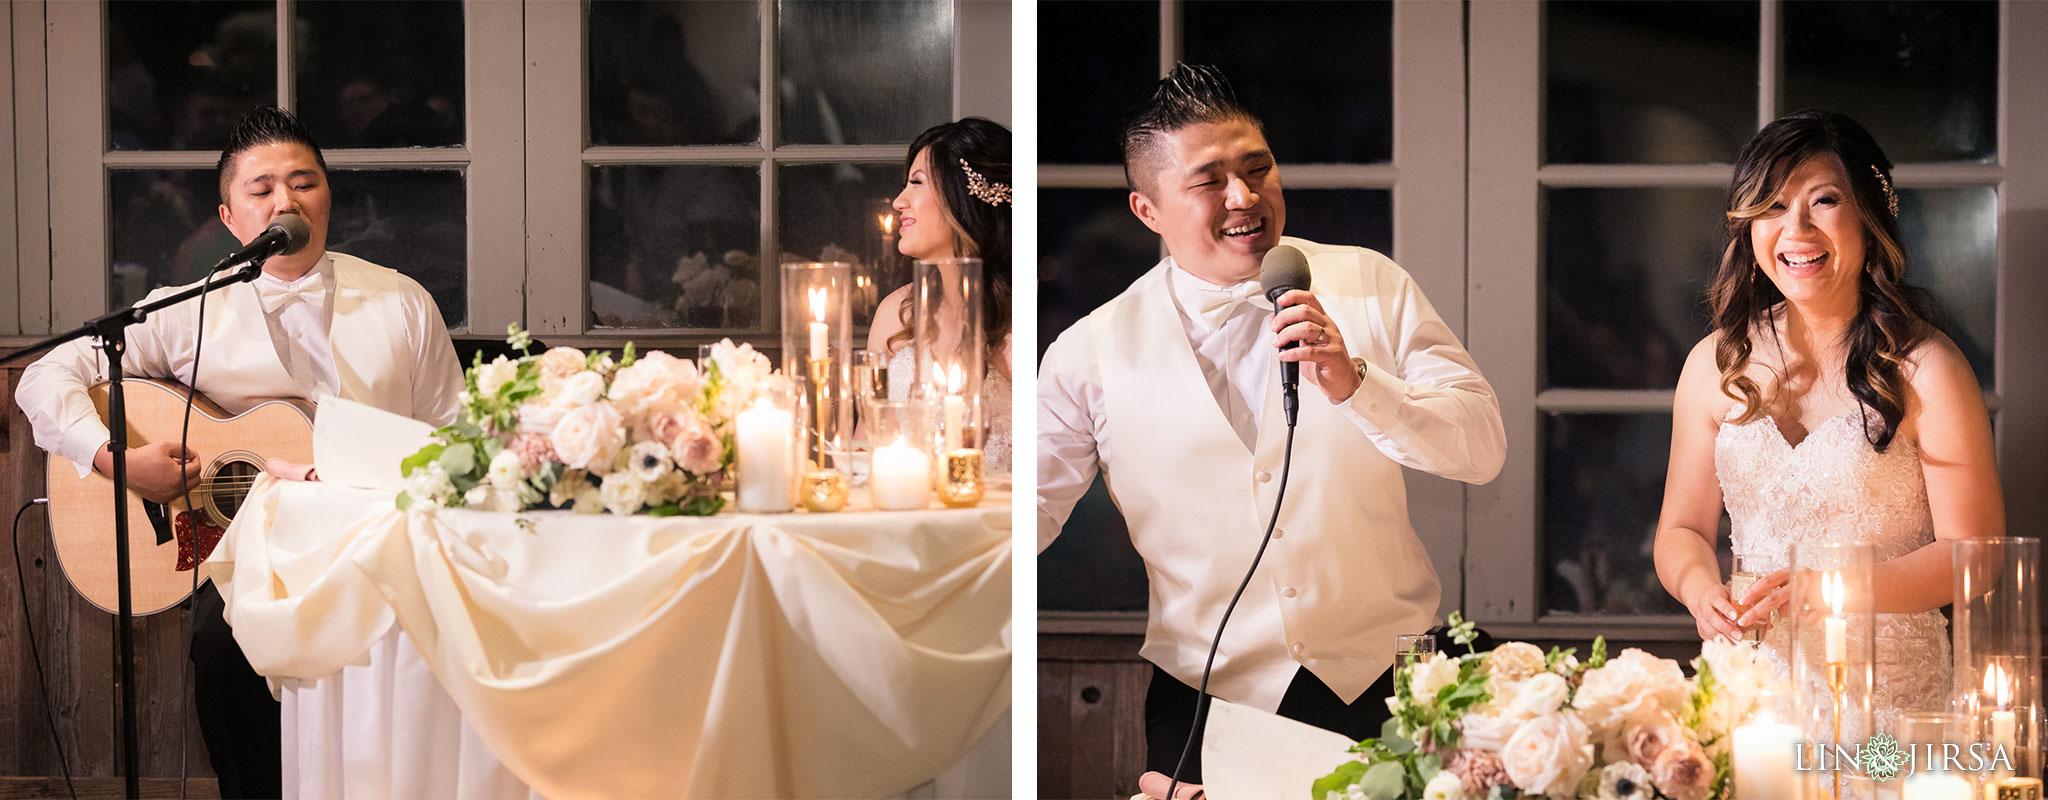 30 calamigos ranch malibu wedding reception photography